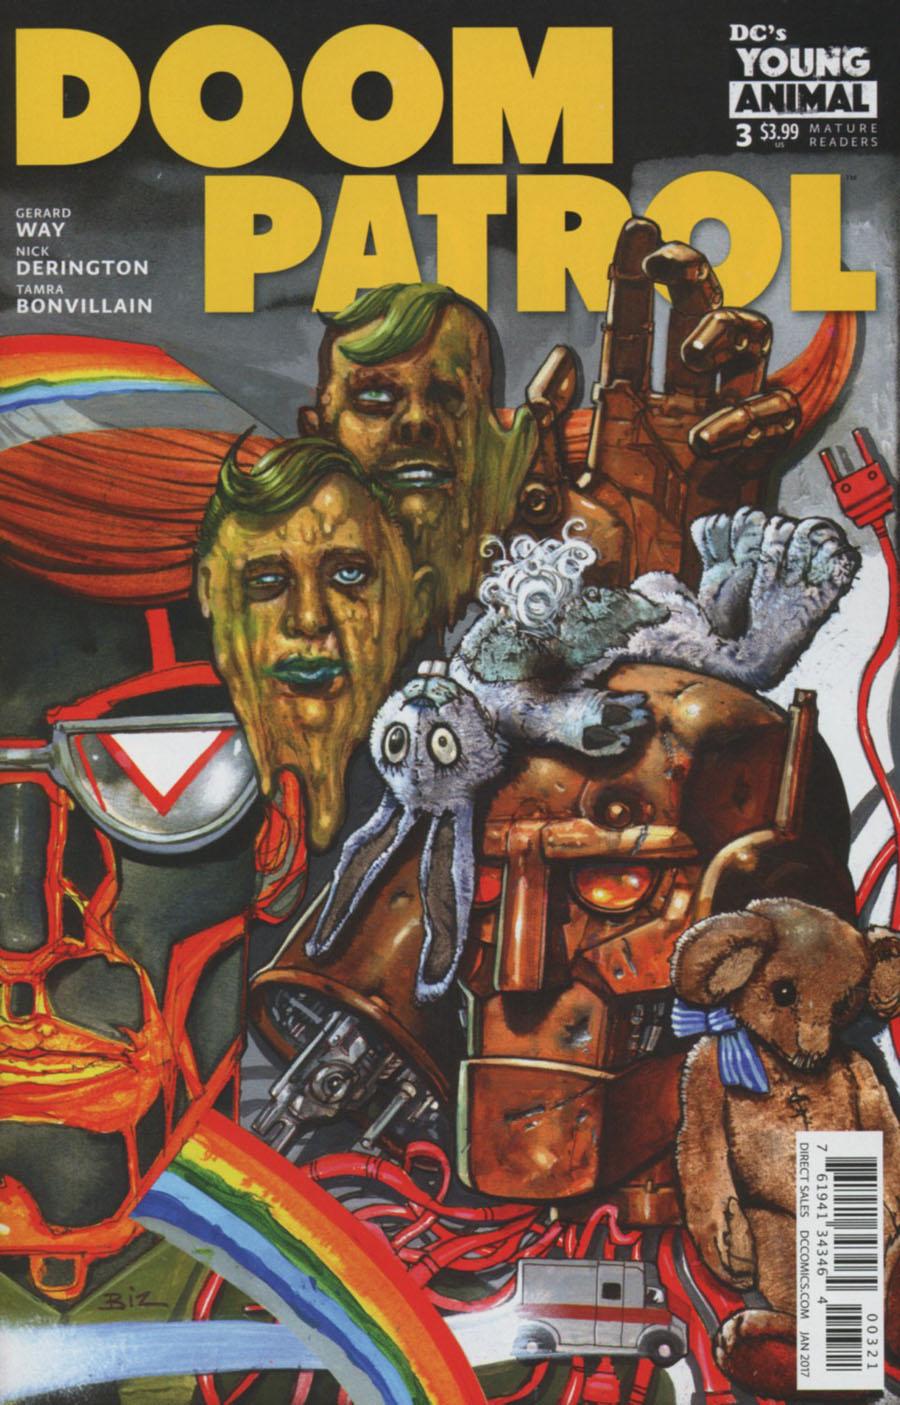 Doom Patrol Vol 6 #3 Cover B Variant Simon Bisley Cover